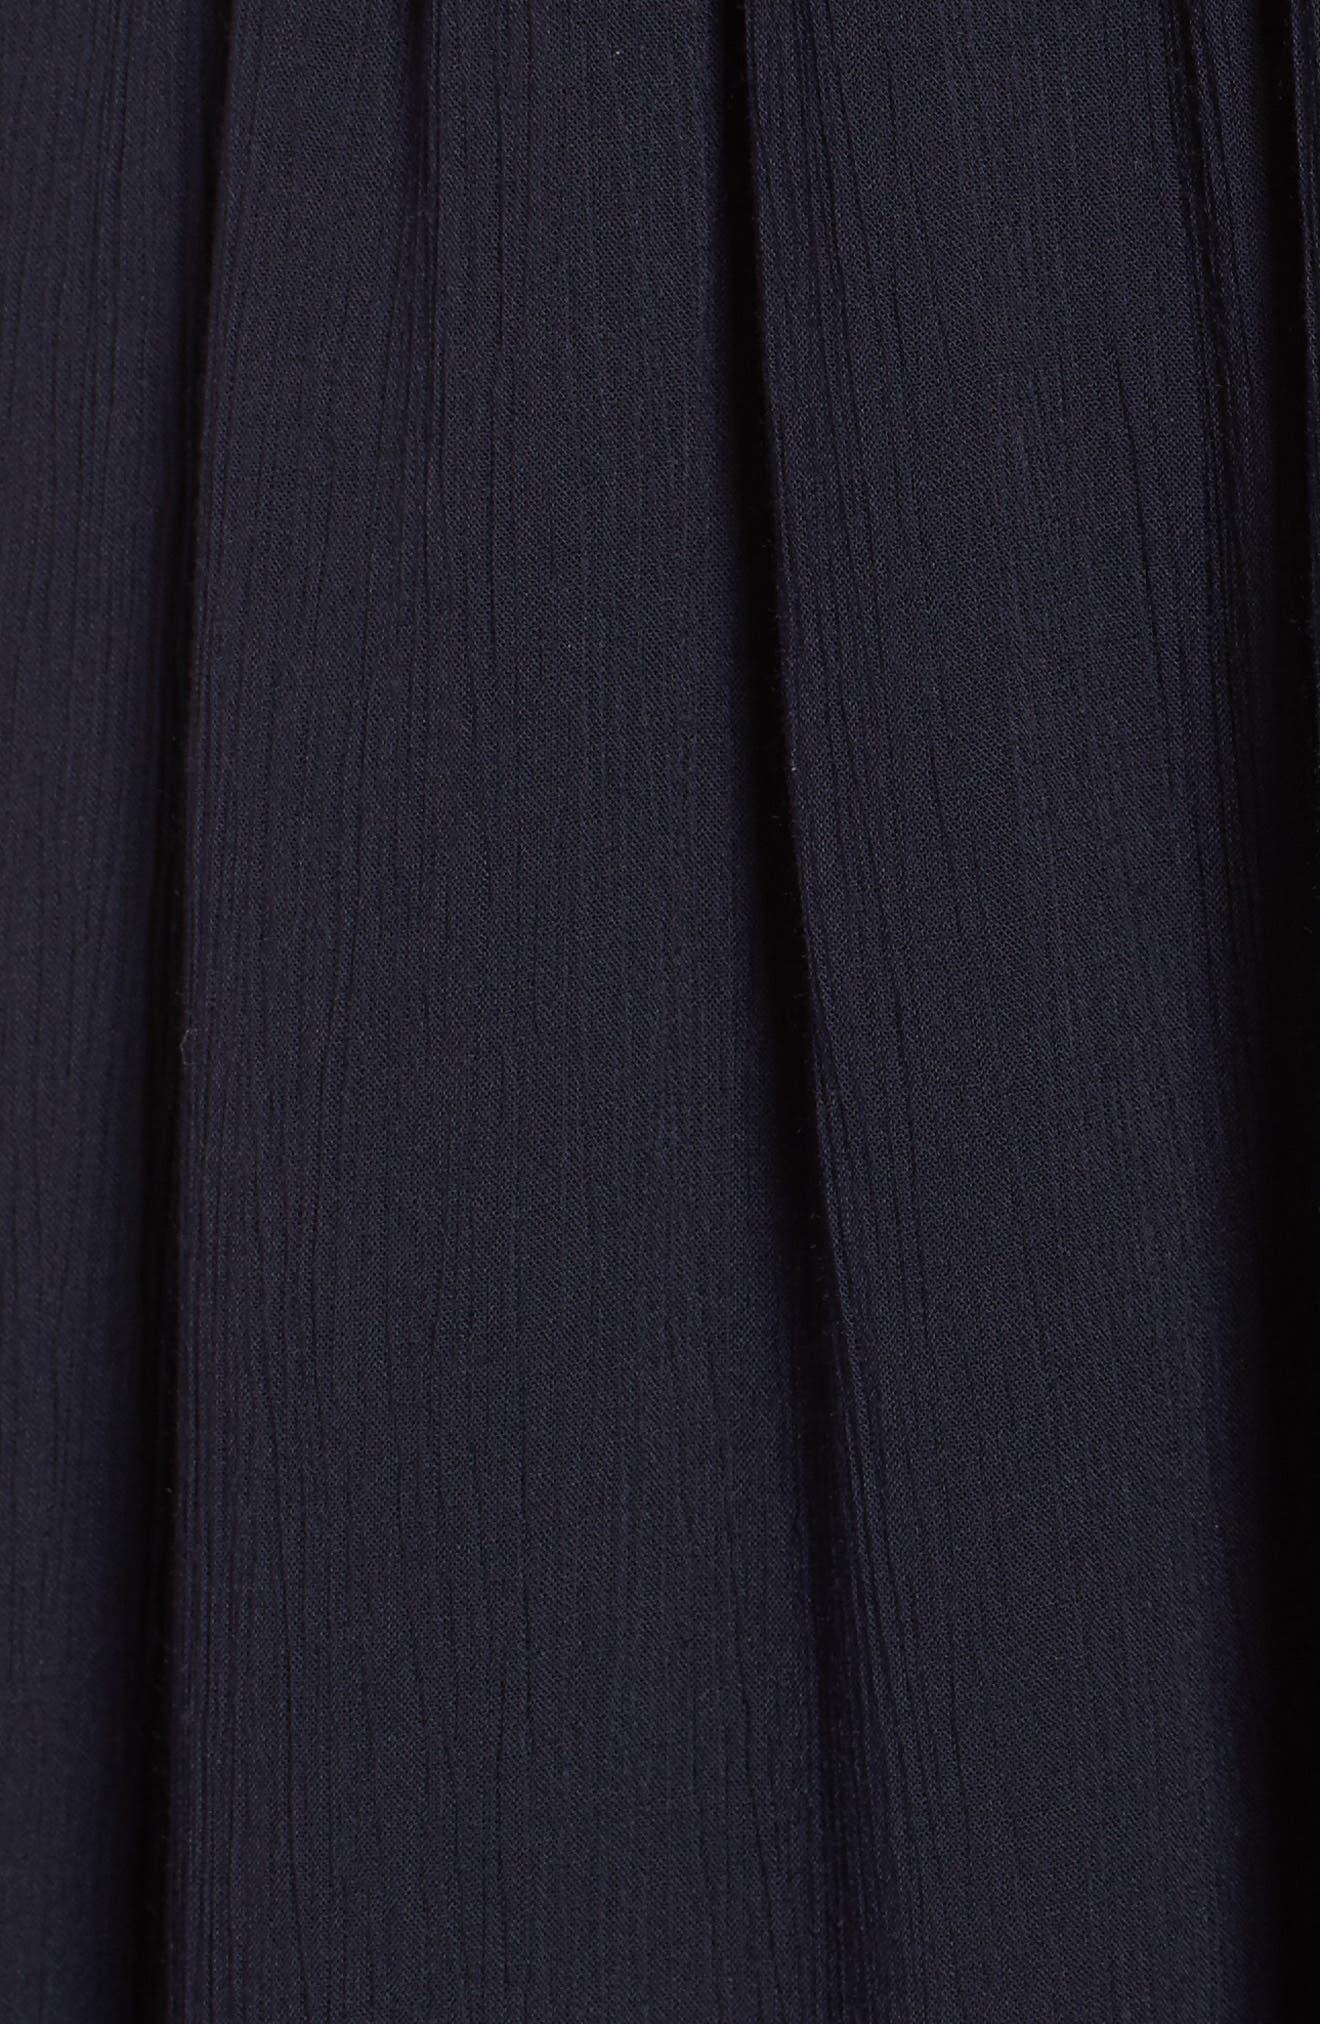 Kerrine Embroidered Maxi Dress,                             Alternate thumbnail 5, color,                             422